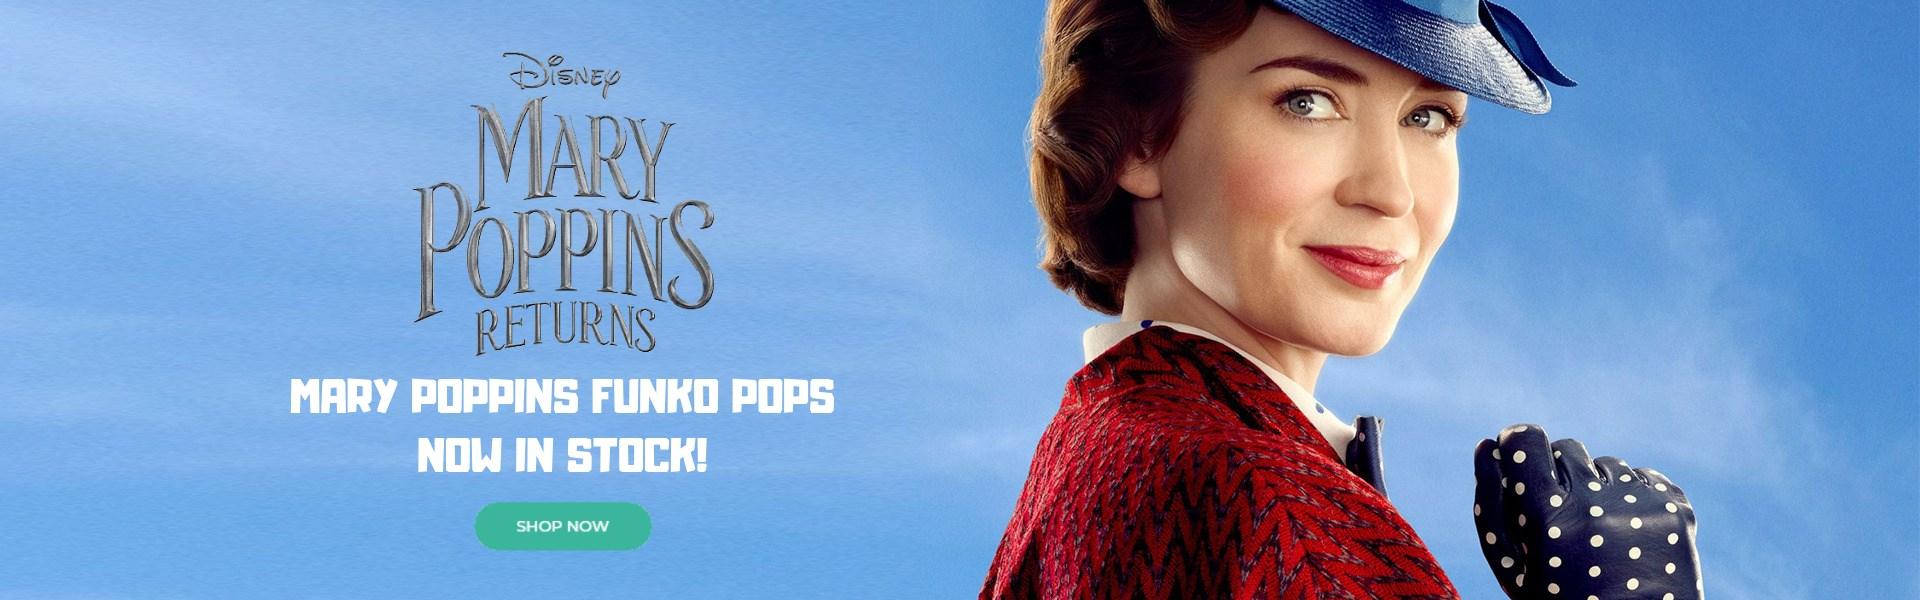 mary poppins returns funko